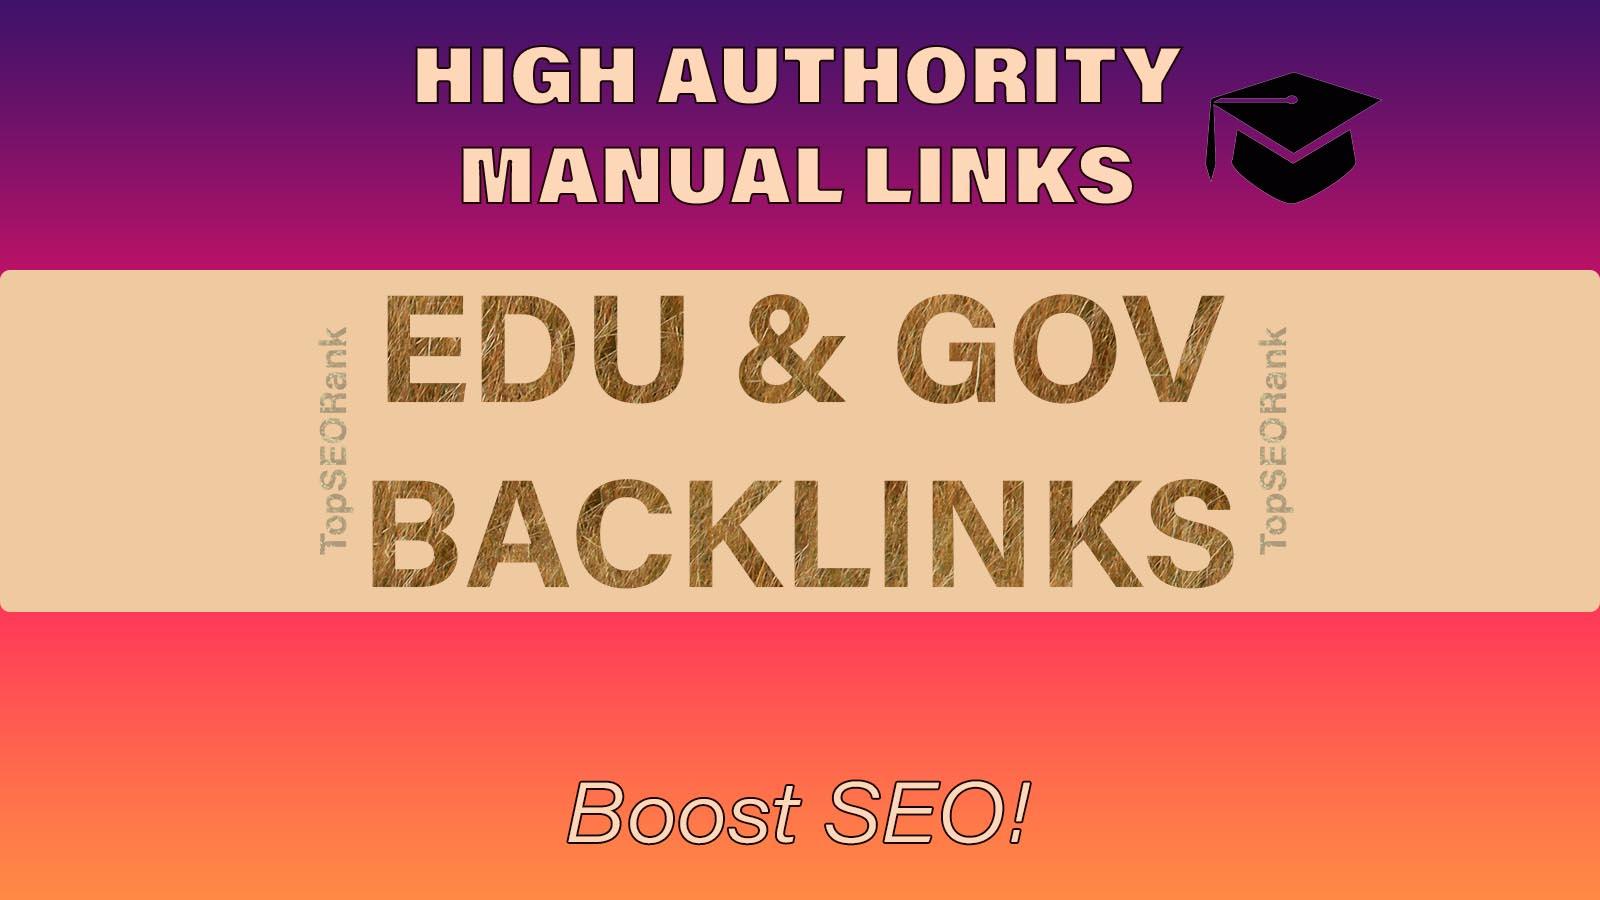 10 High Authority EDU Backlinks to Boost SEO